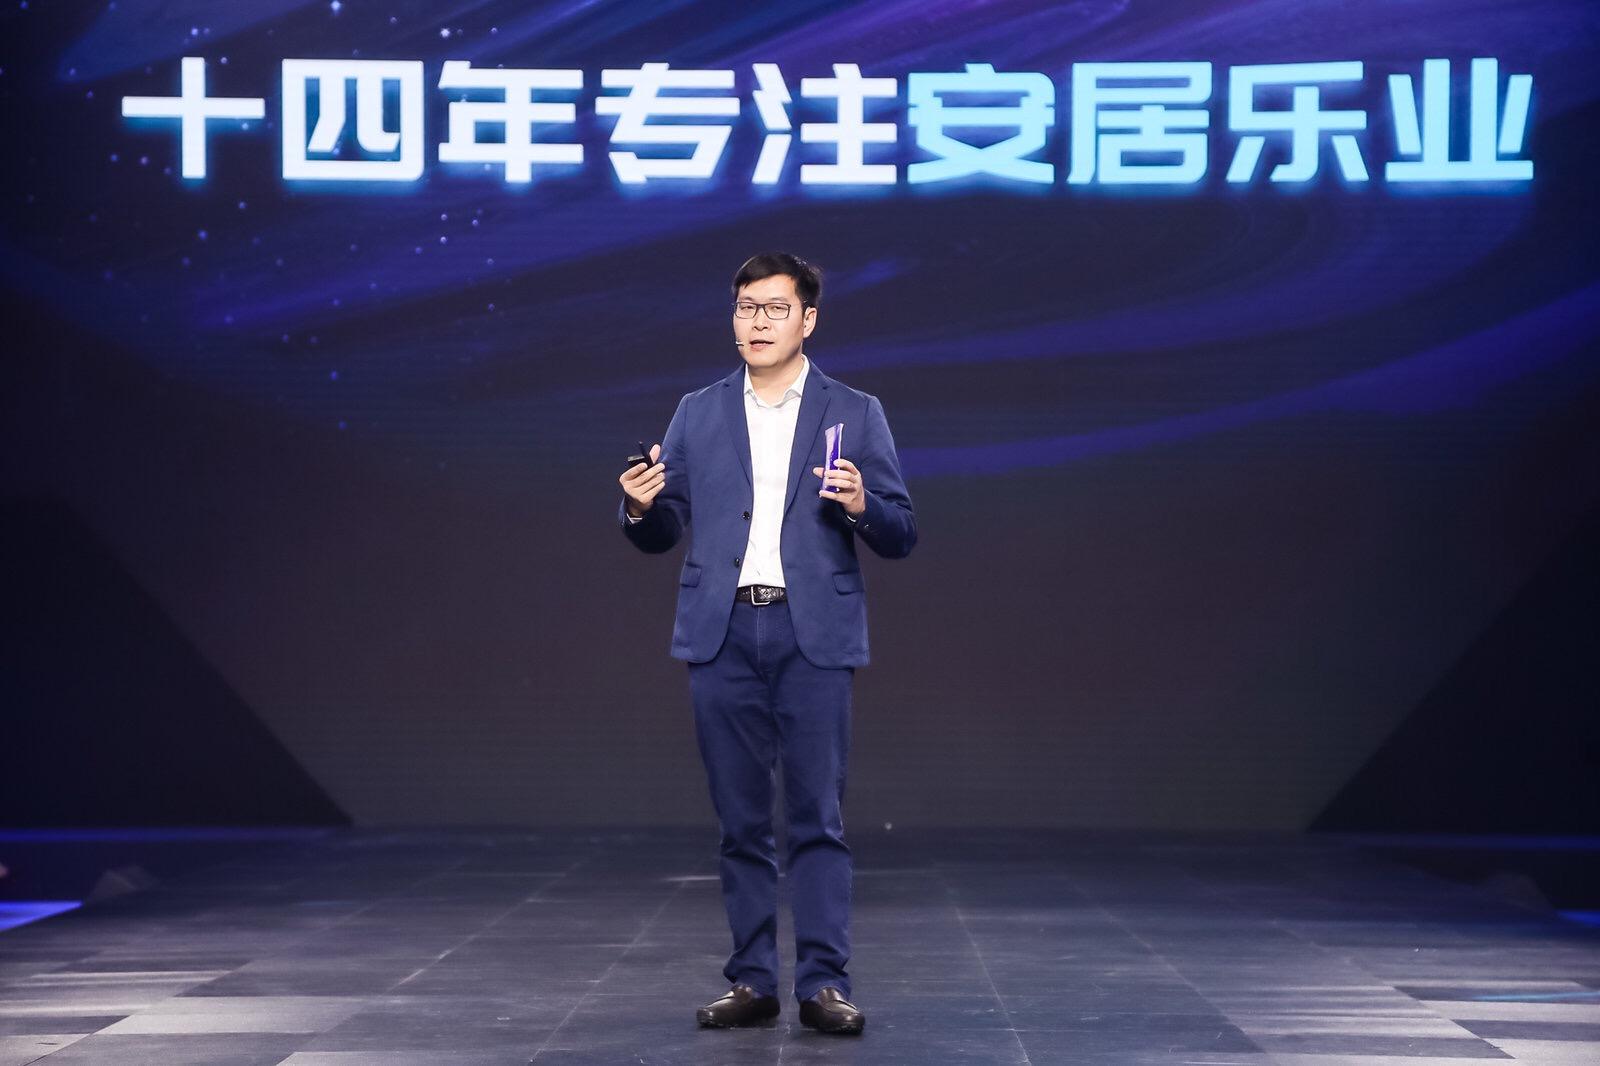 58.com introduces user interaction platform